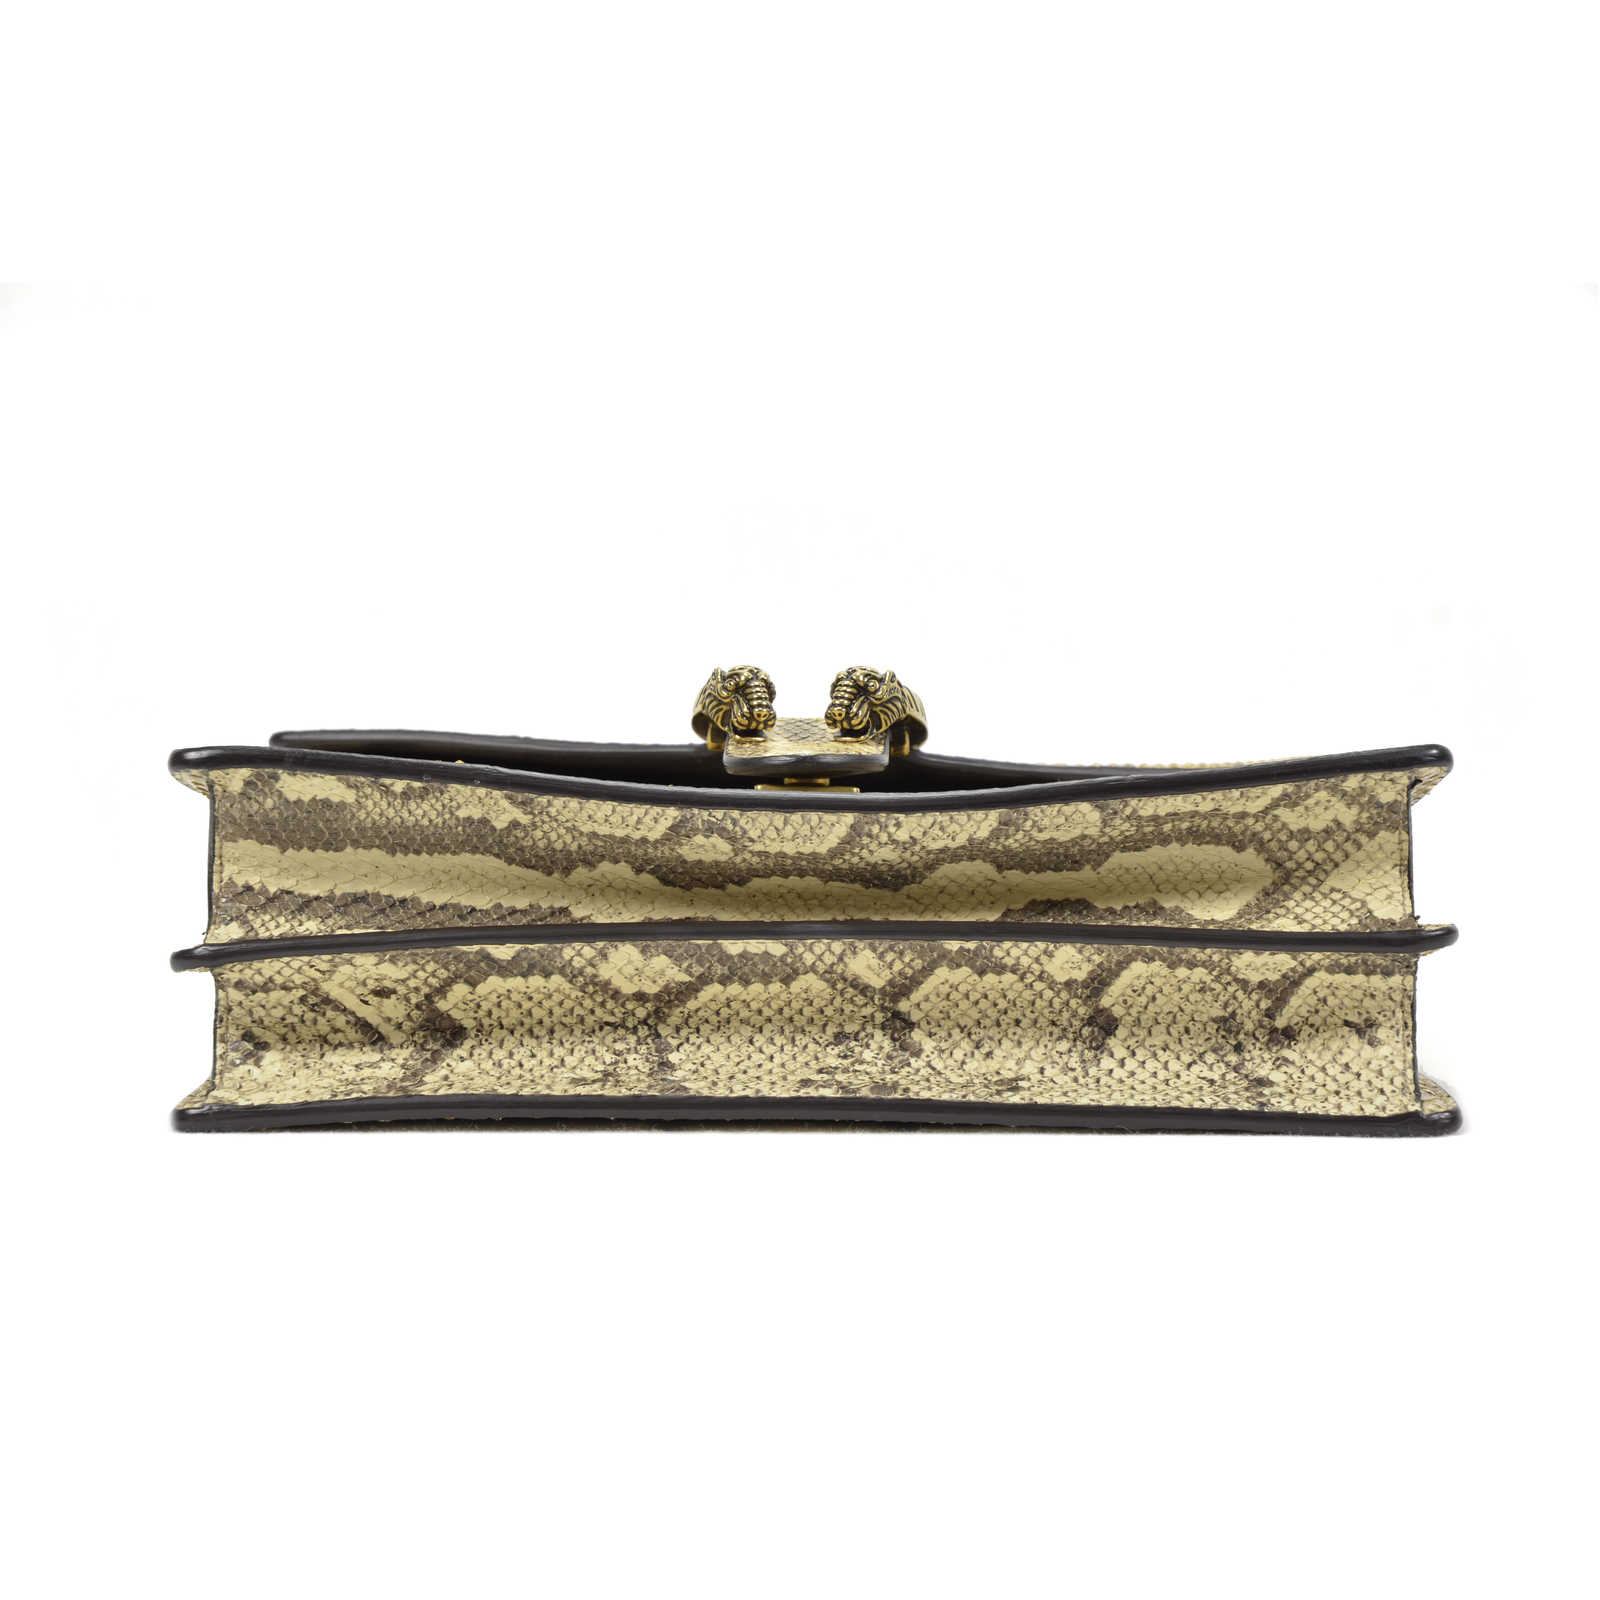 70e2c1643 ... Authentic Second Hand Gucci Dionysus Python Shoulder Bag  (PSS-051-00162) ...